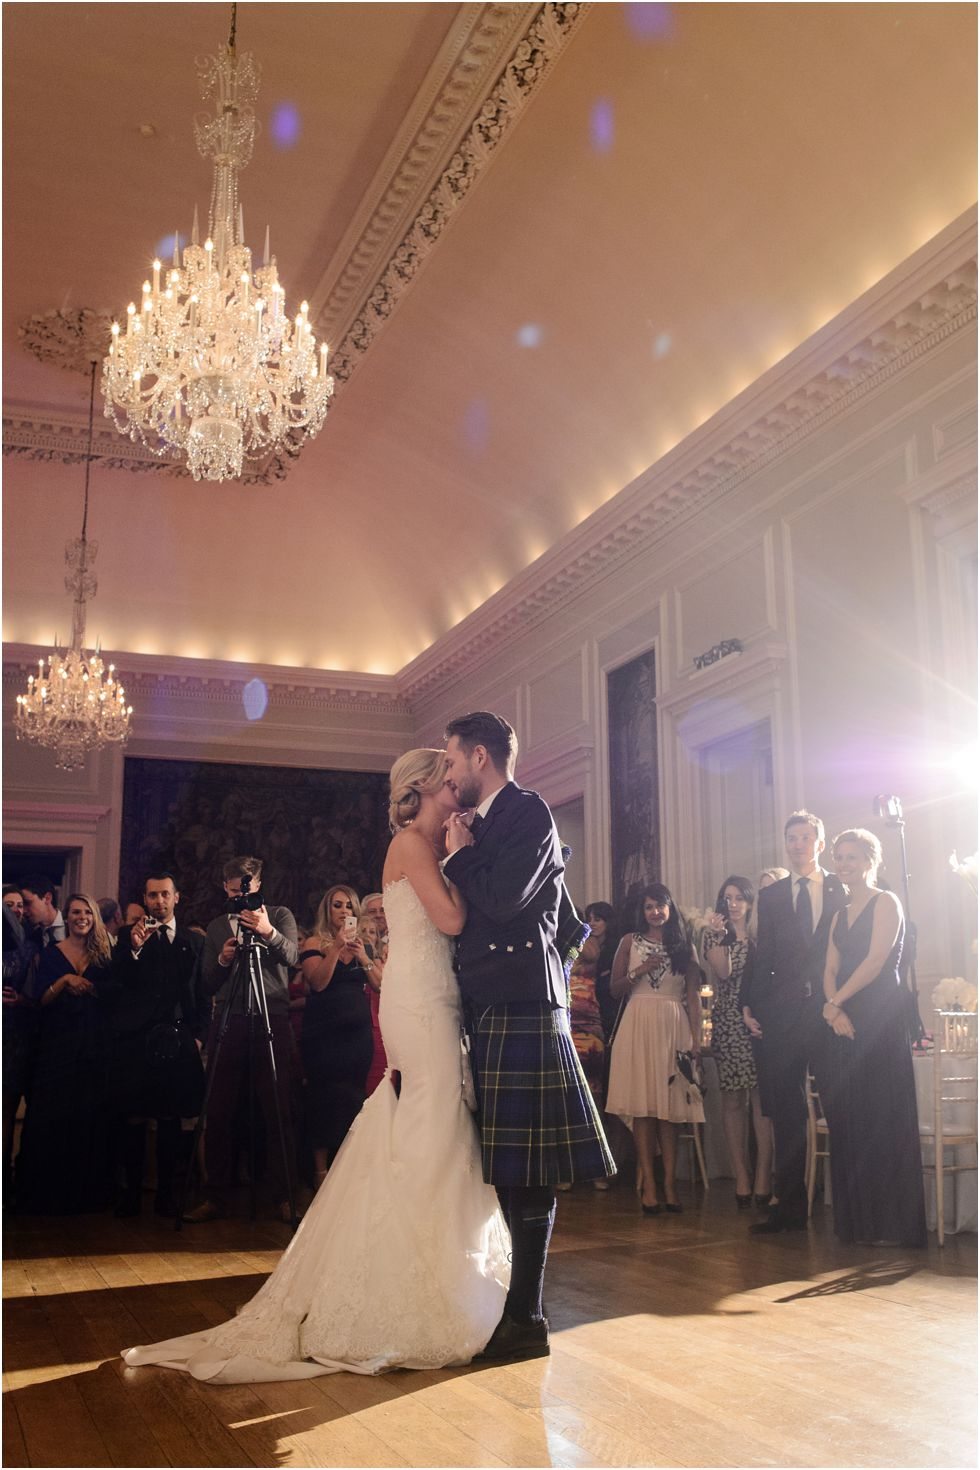 Hopetoun-House-wedding-photography-Edinburgh-78.jpg